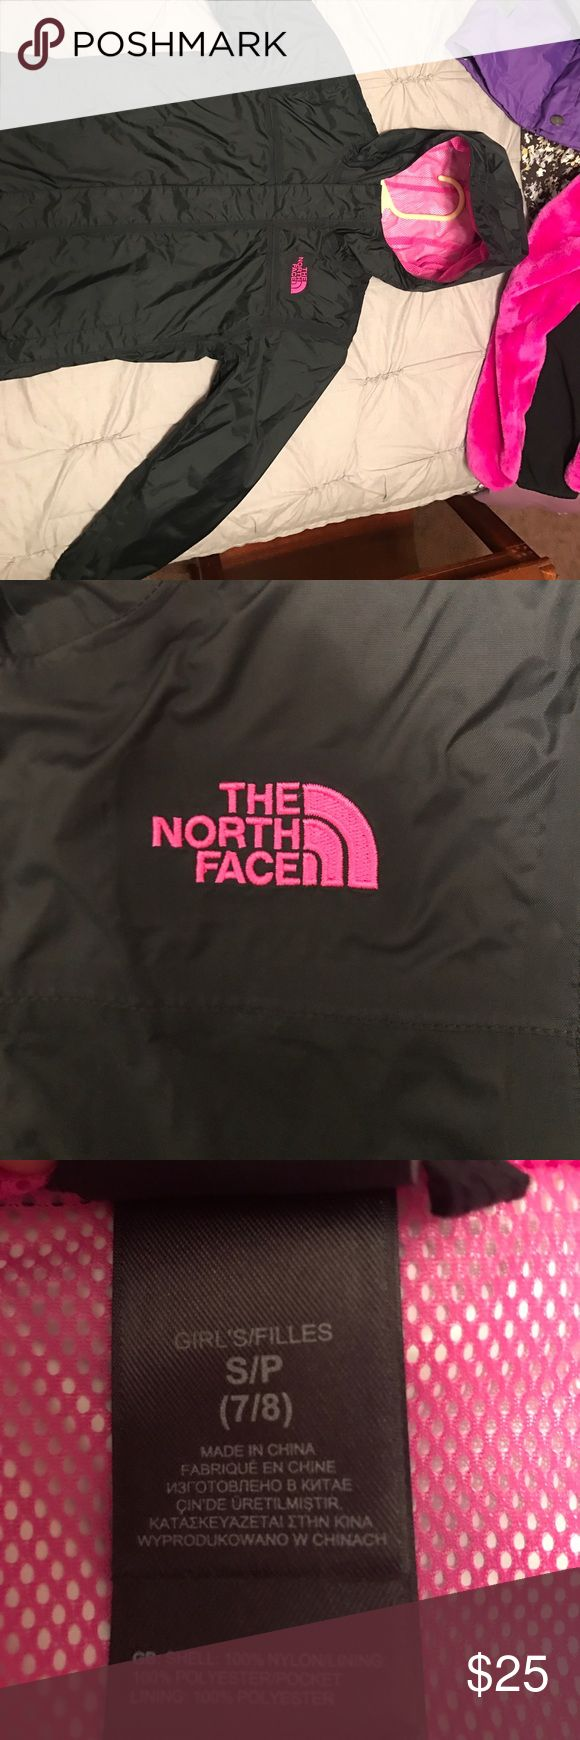 Girls size small north face rain jacket Black and pink girls north face jacket size small (8/9) North Face Jackets & Coats